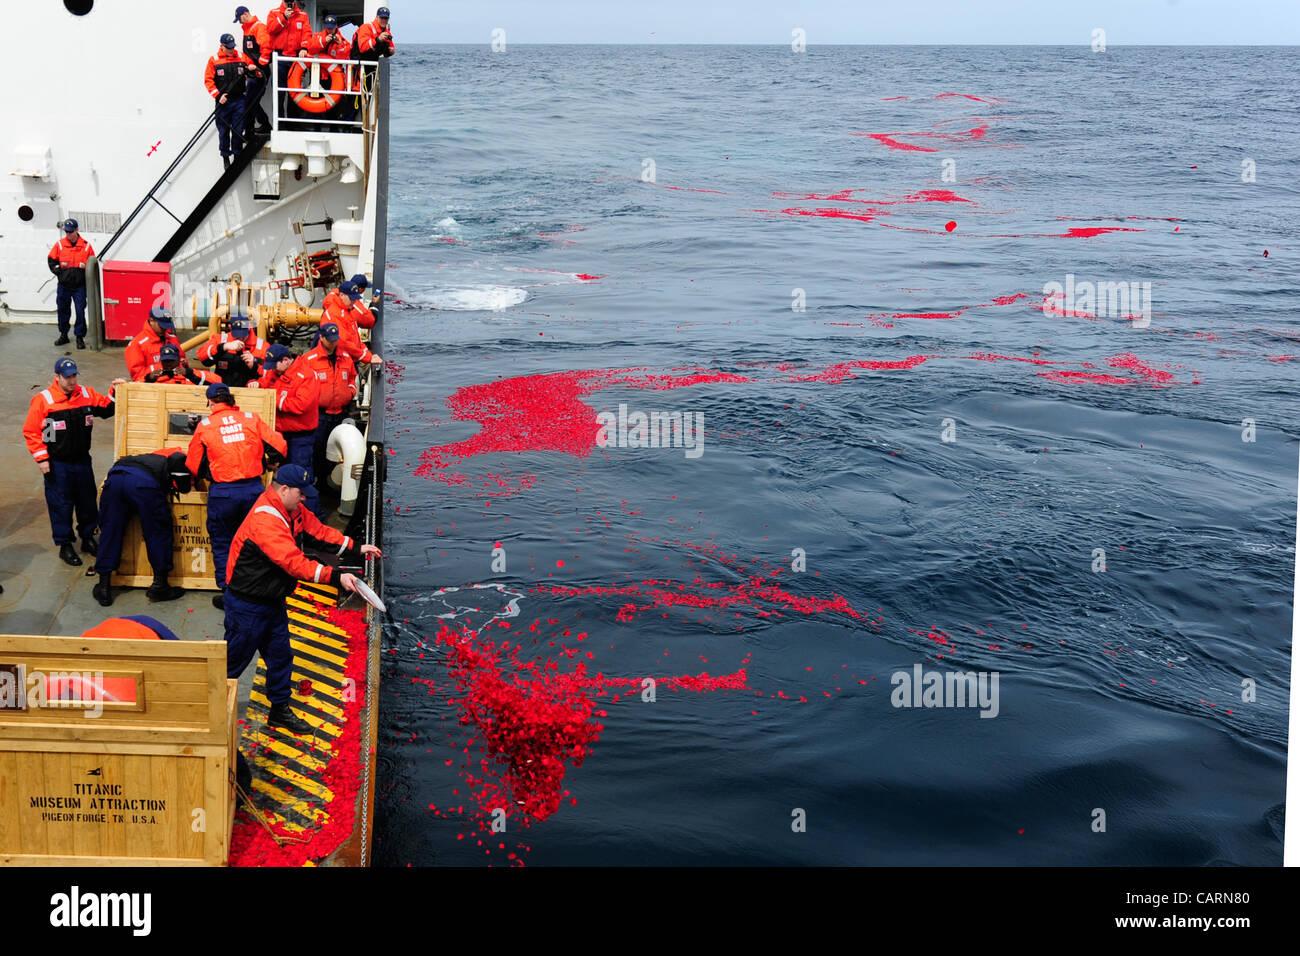 Nordatlantik ? Website US Coast Guard Cutter Juniper Besatzungsmitglieder Laie 1,5 Millionen getrockneten Rosenblättern Stockbild